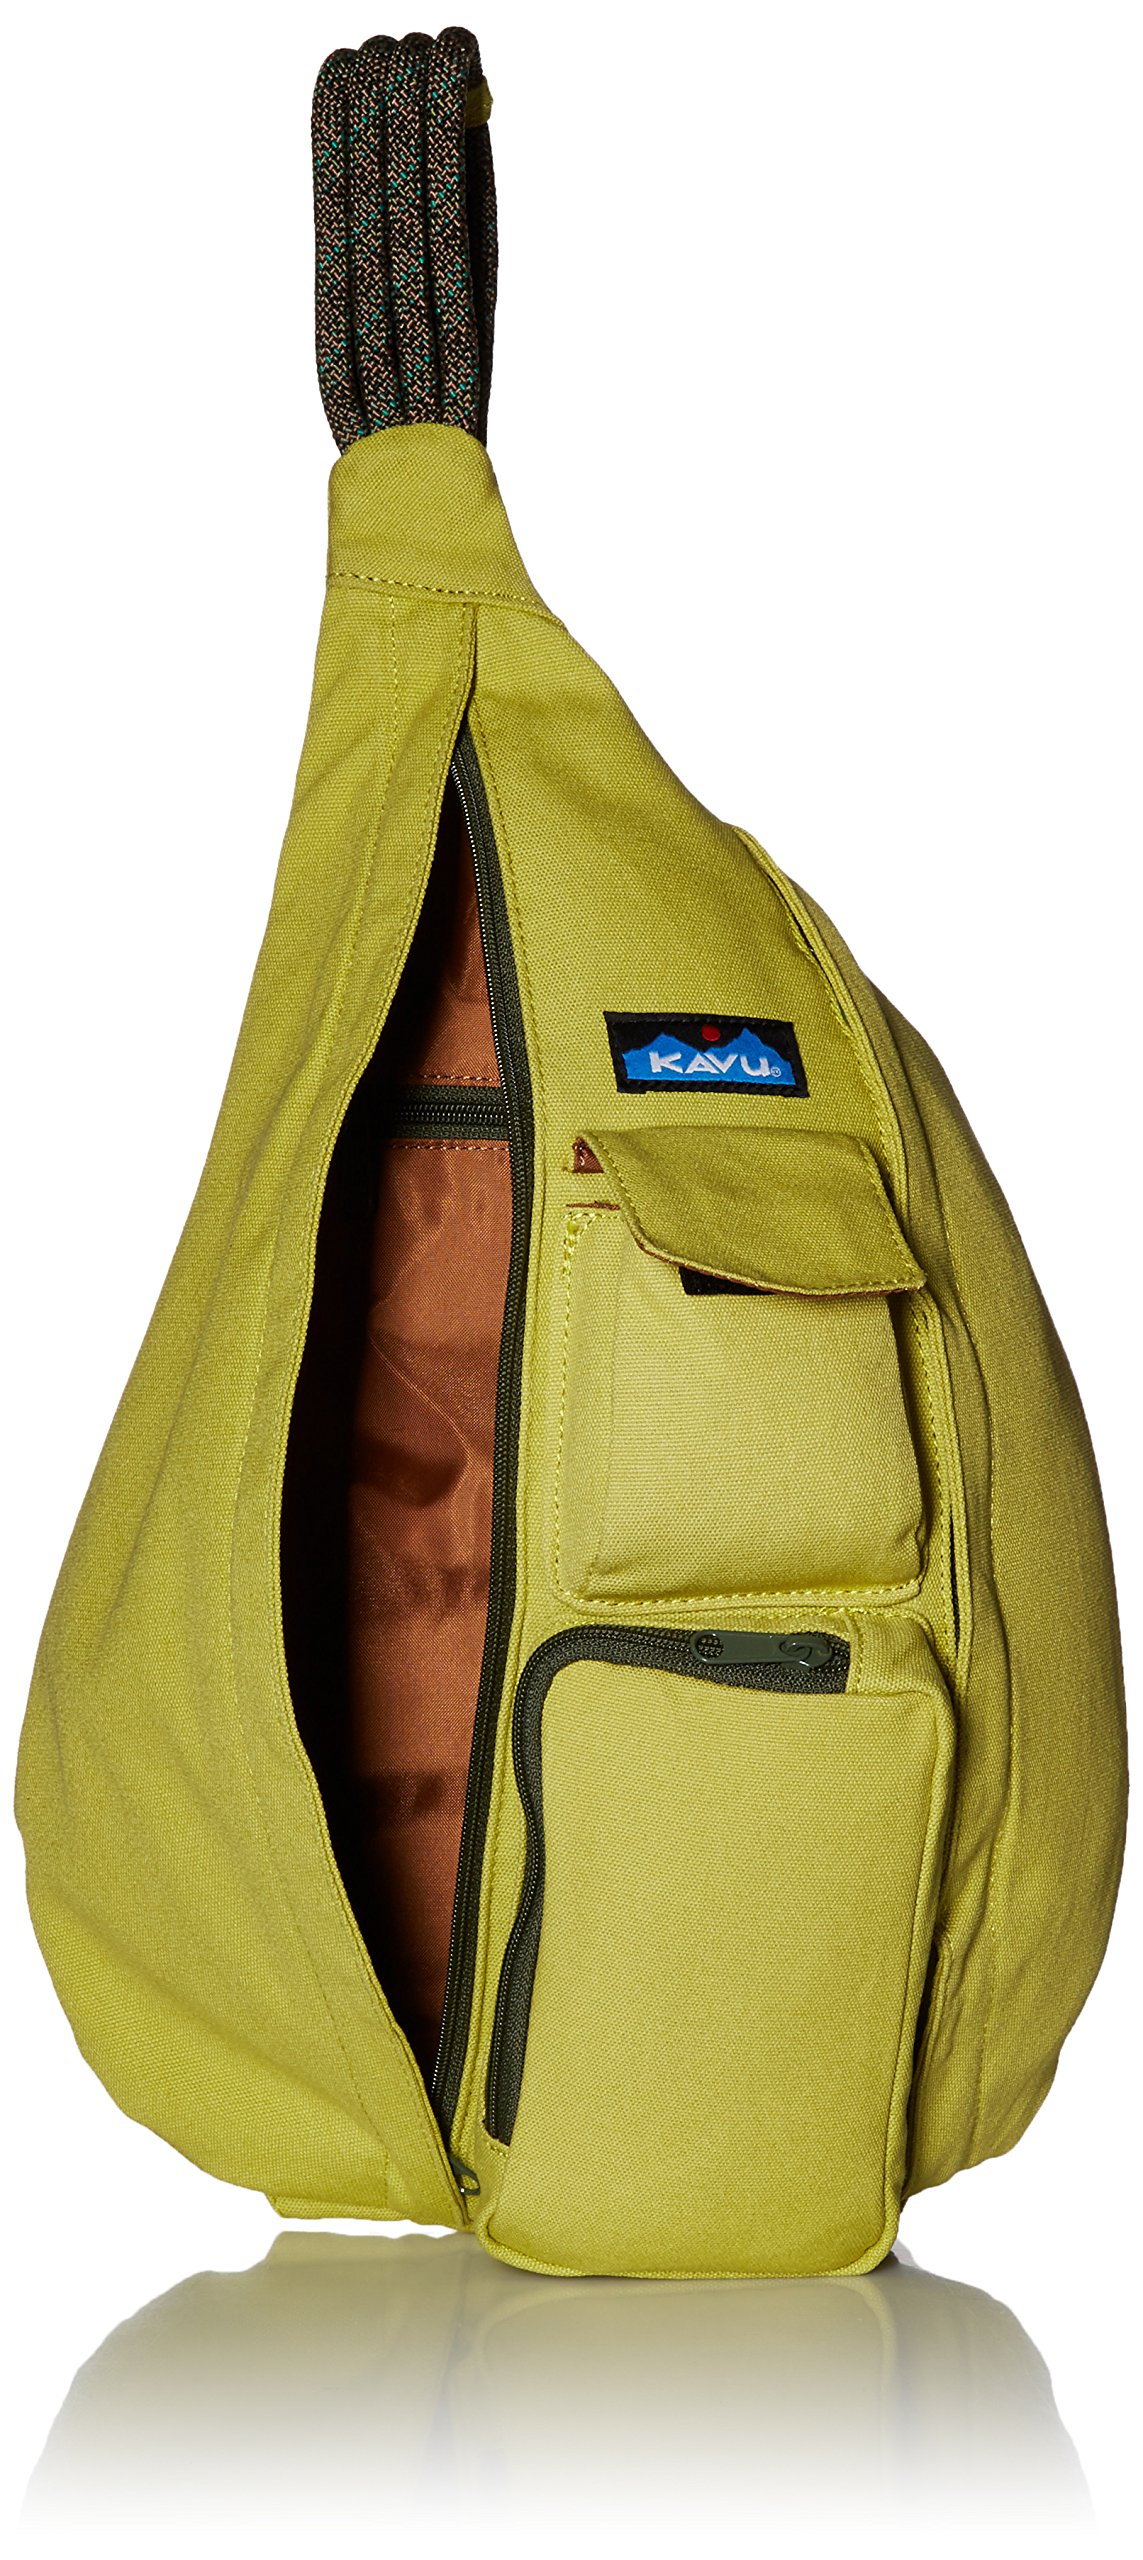 KAVU Rope Bag, Acid Green, One Size by KAVU (Image #3)